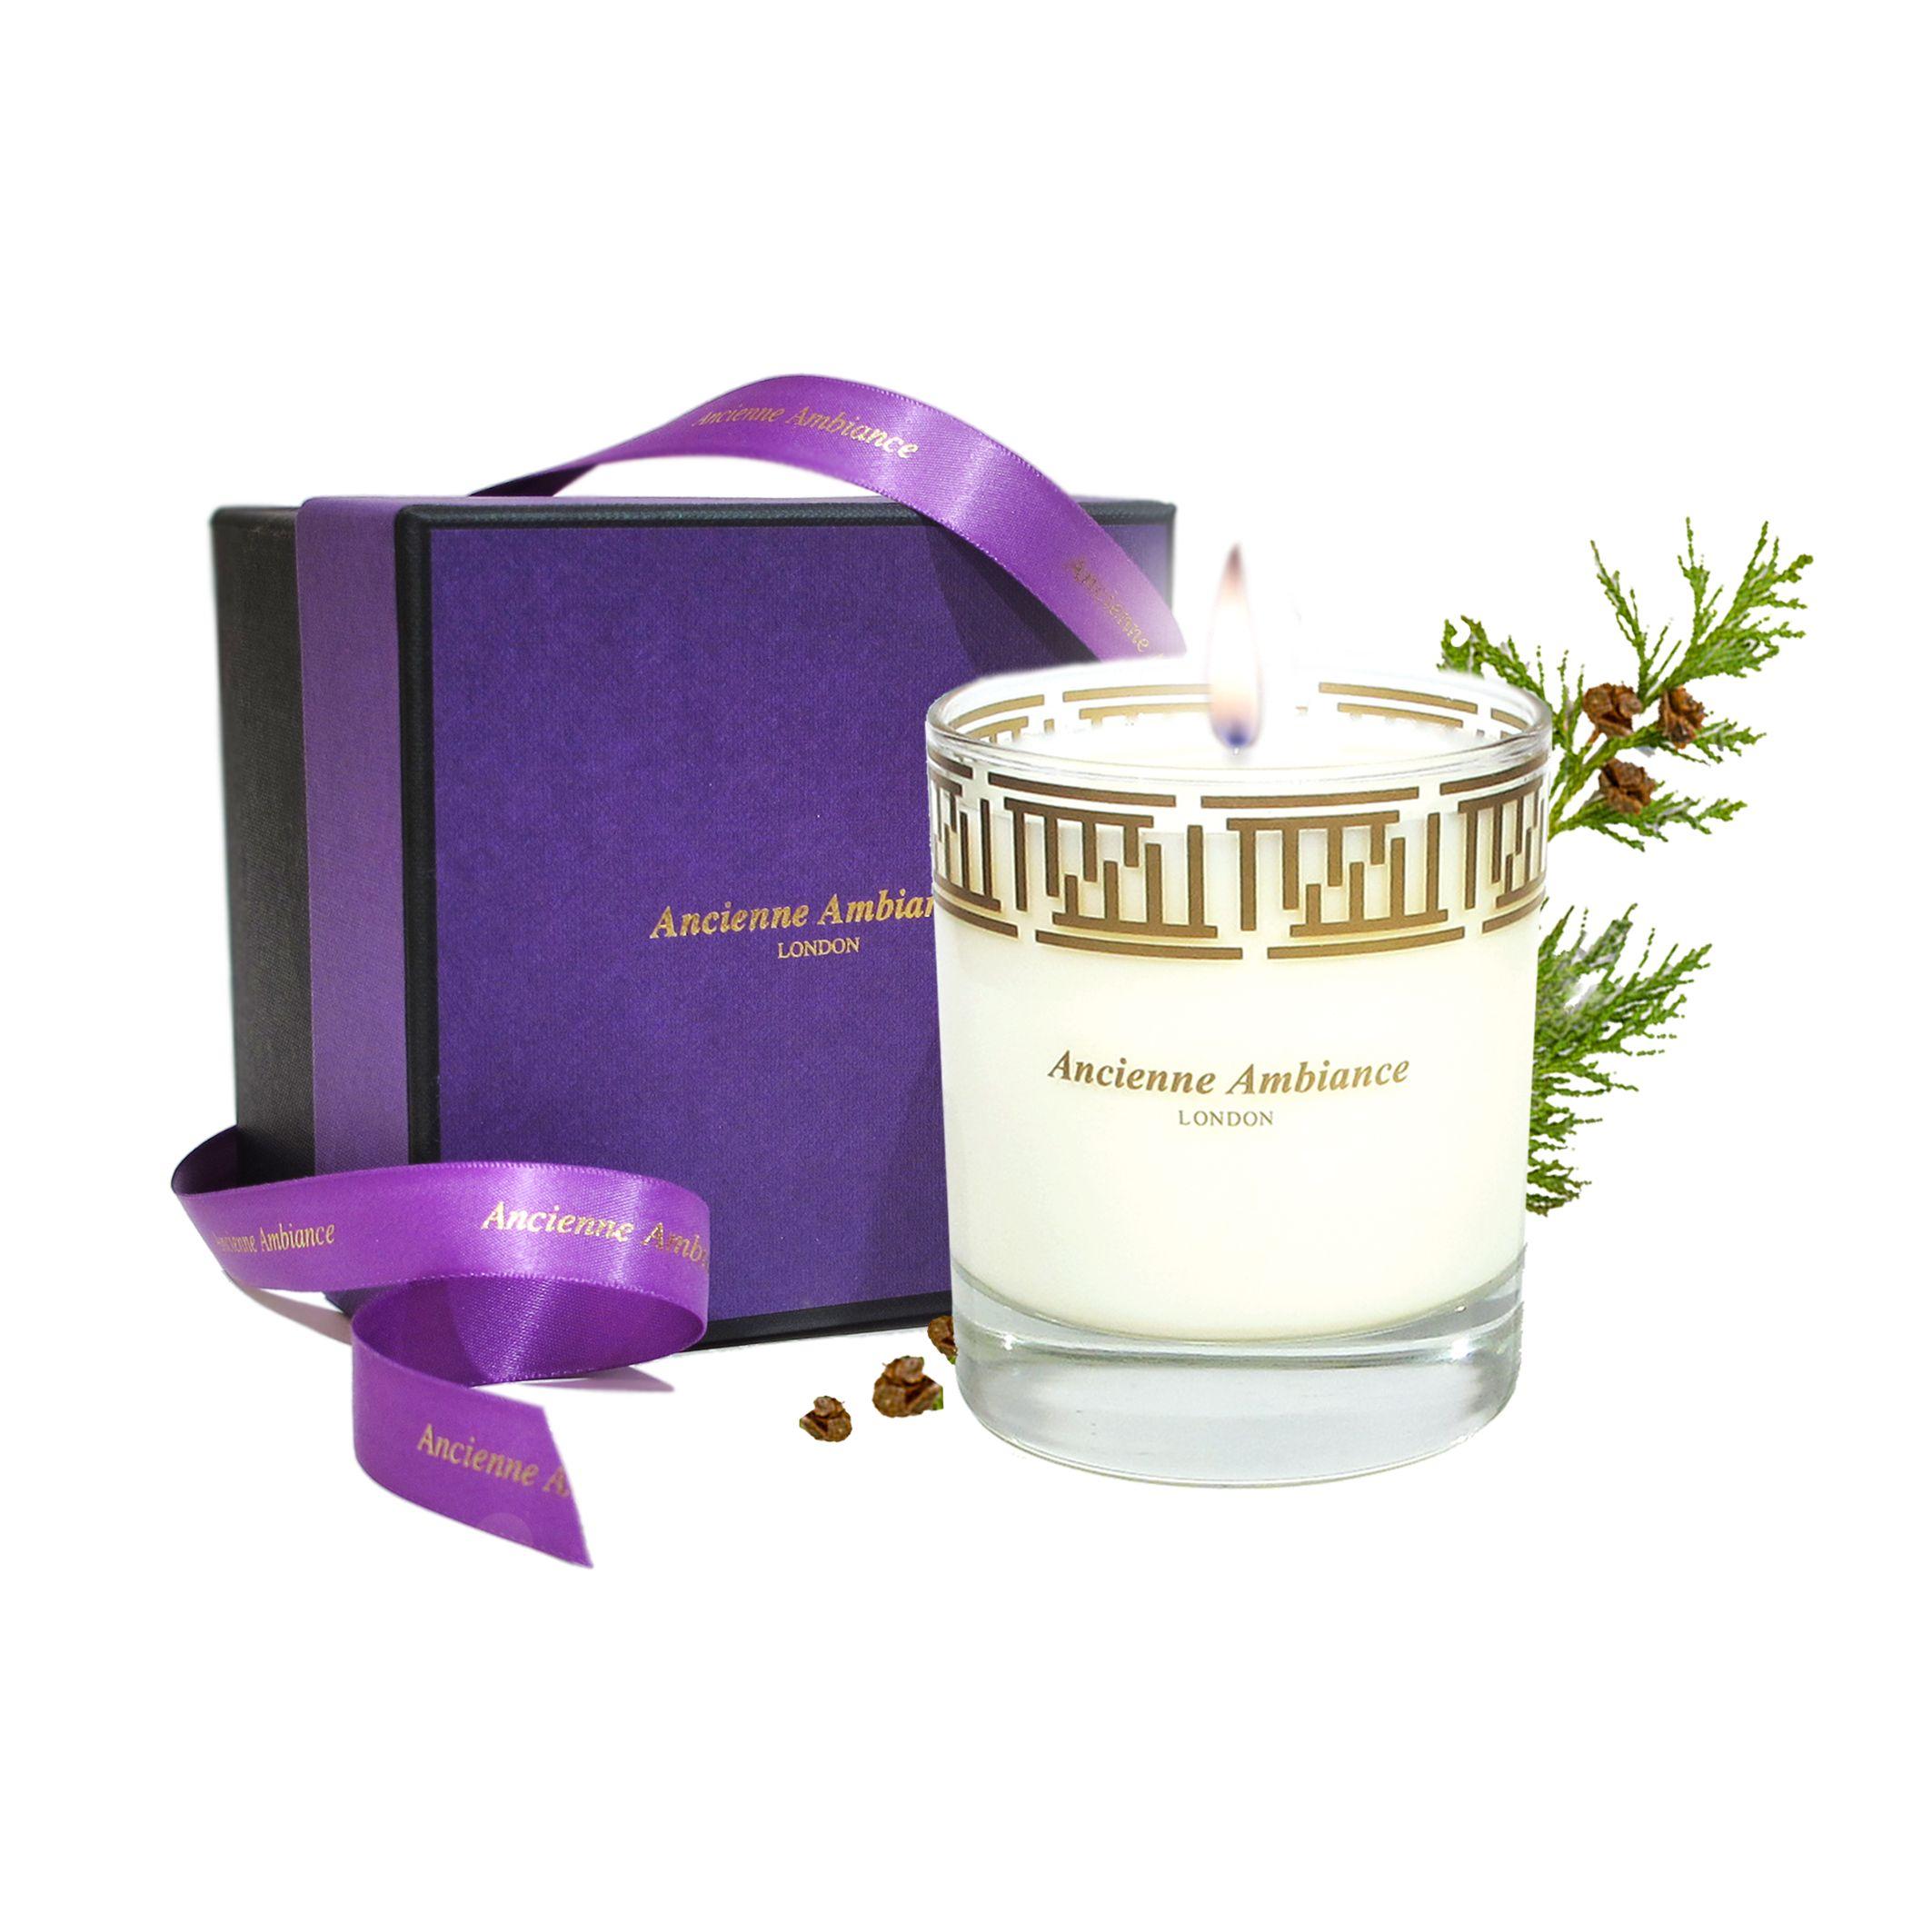 Phoenicia Candle Cedar fragrance, uplifting & warm. Burn